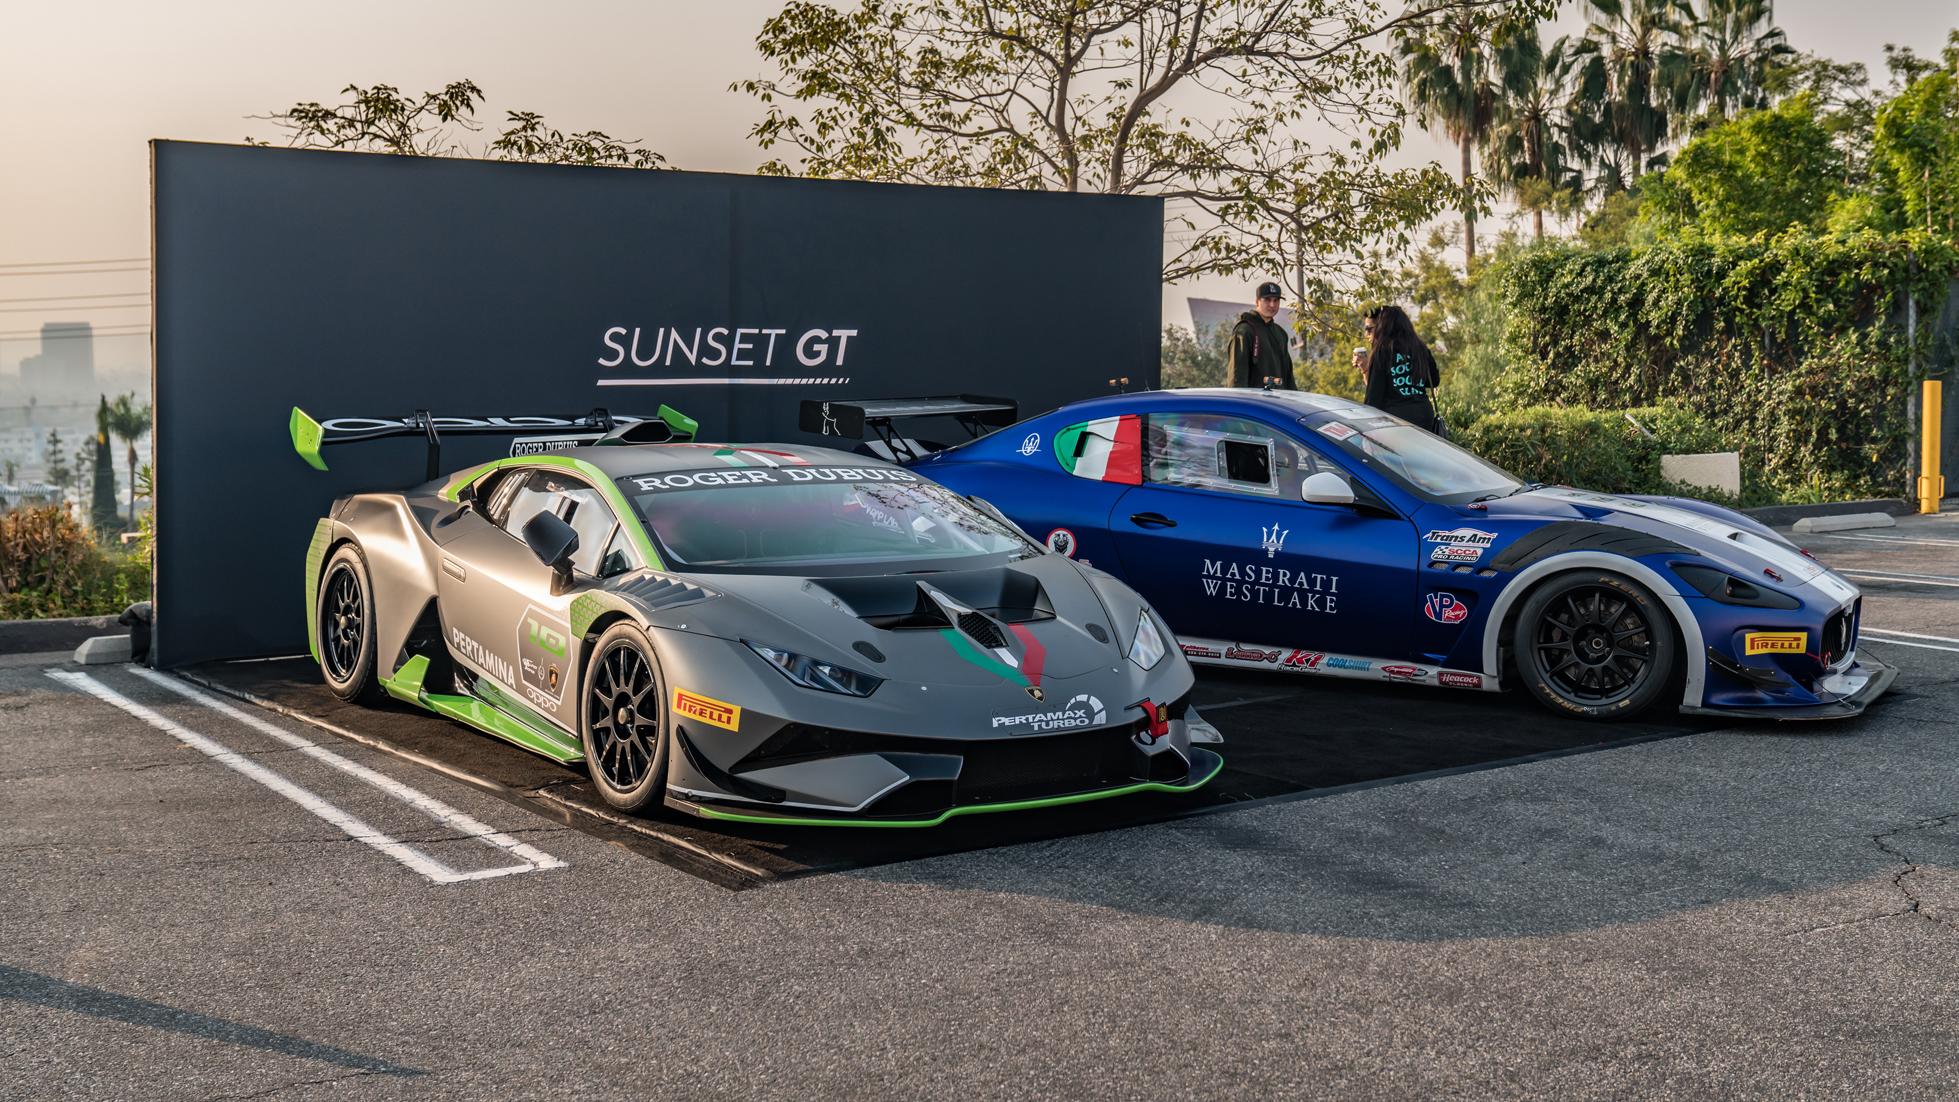 Sunset-GT-Nov-18-2 O'Gara Coach Company Beverly Hills Lambo Maserati